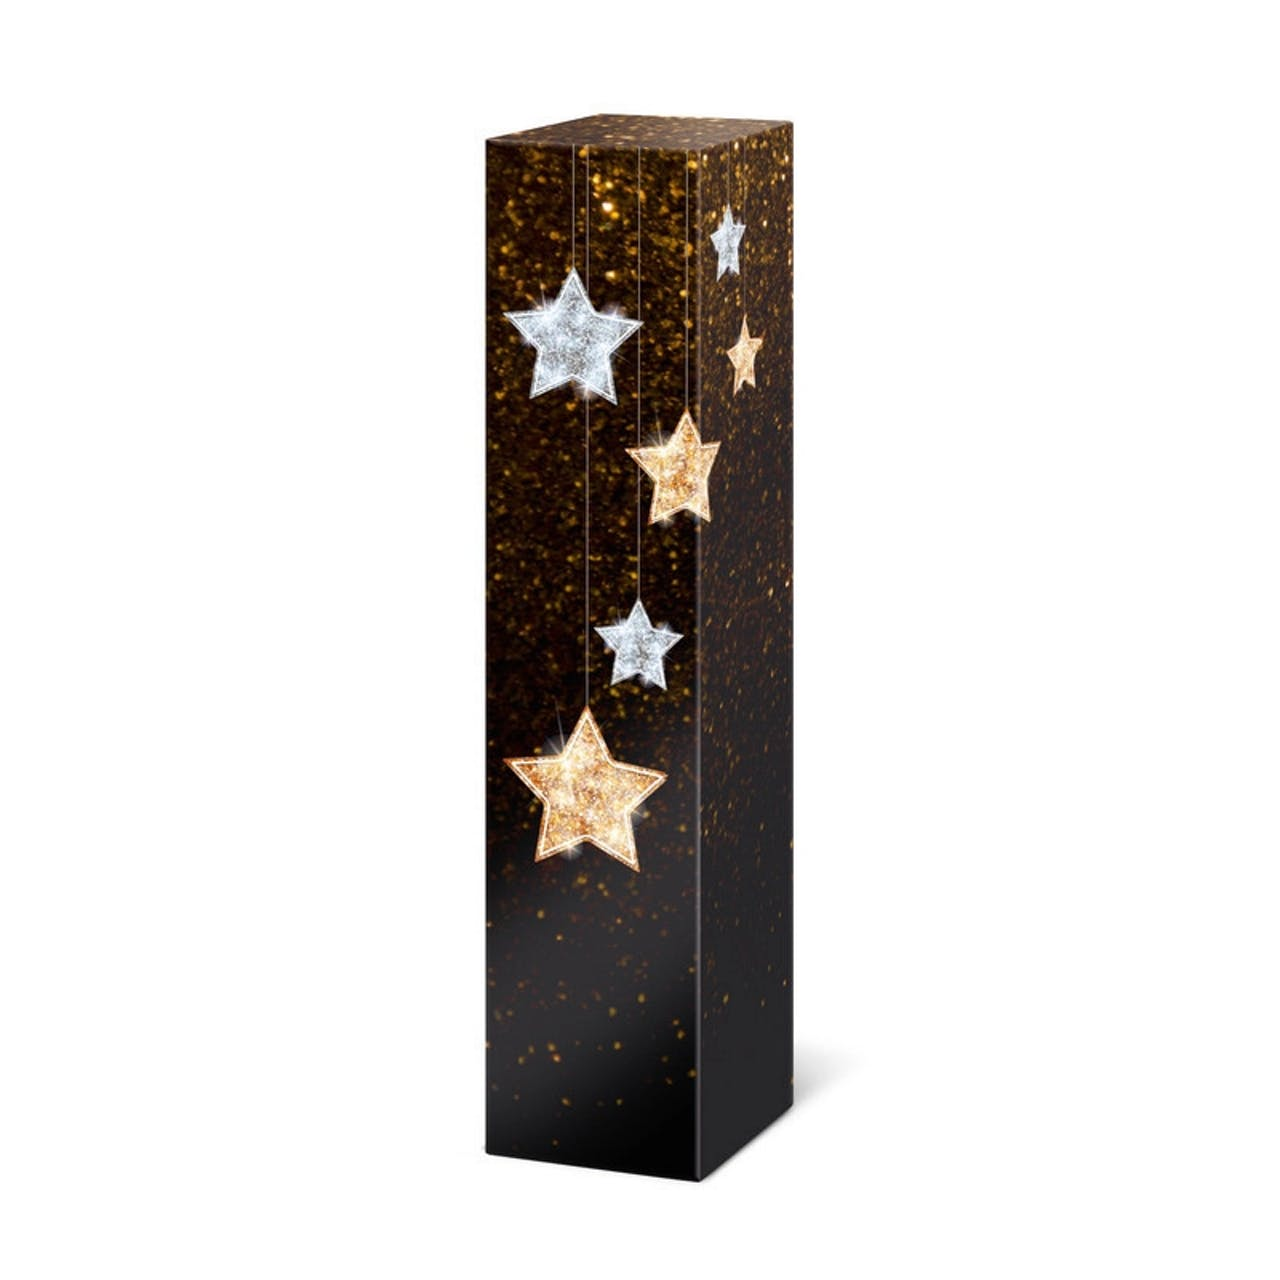 Flaschen-Geschenkfaltschachtel, Sterne, VAR: fsst3